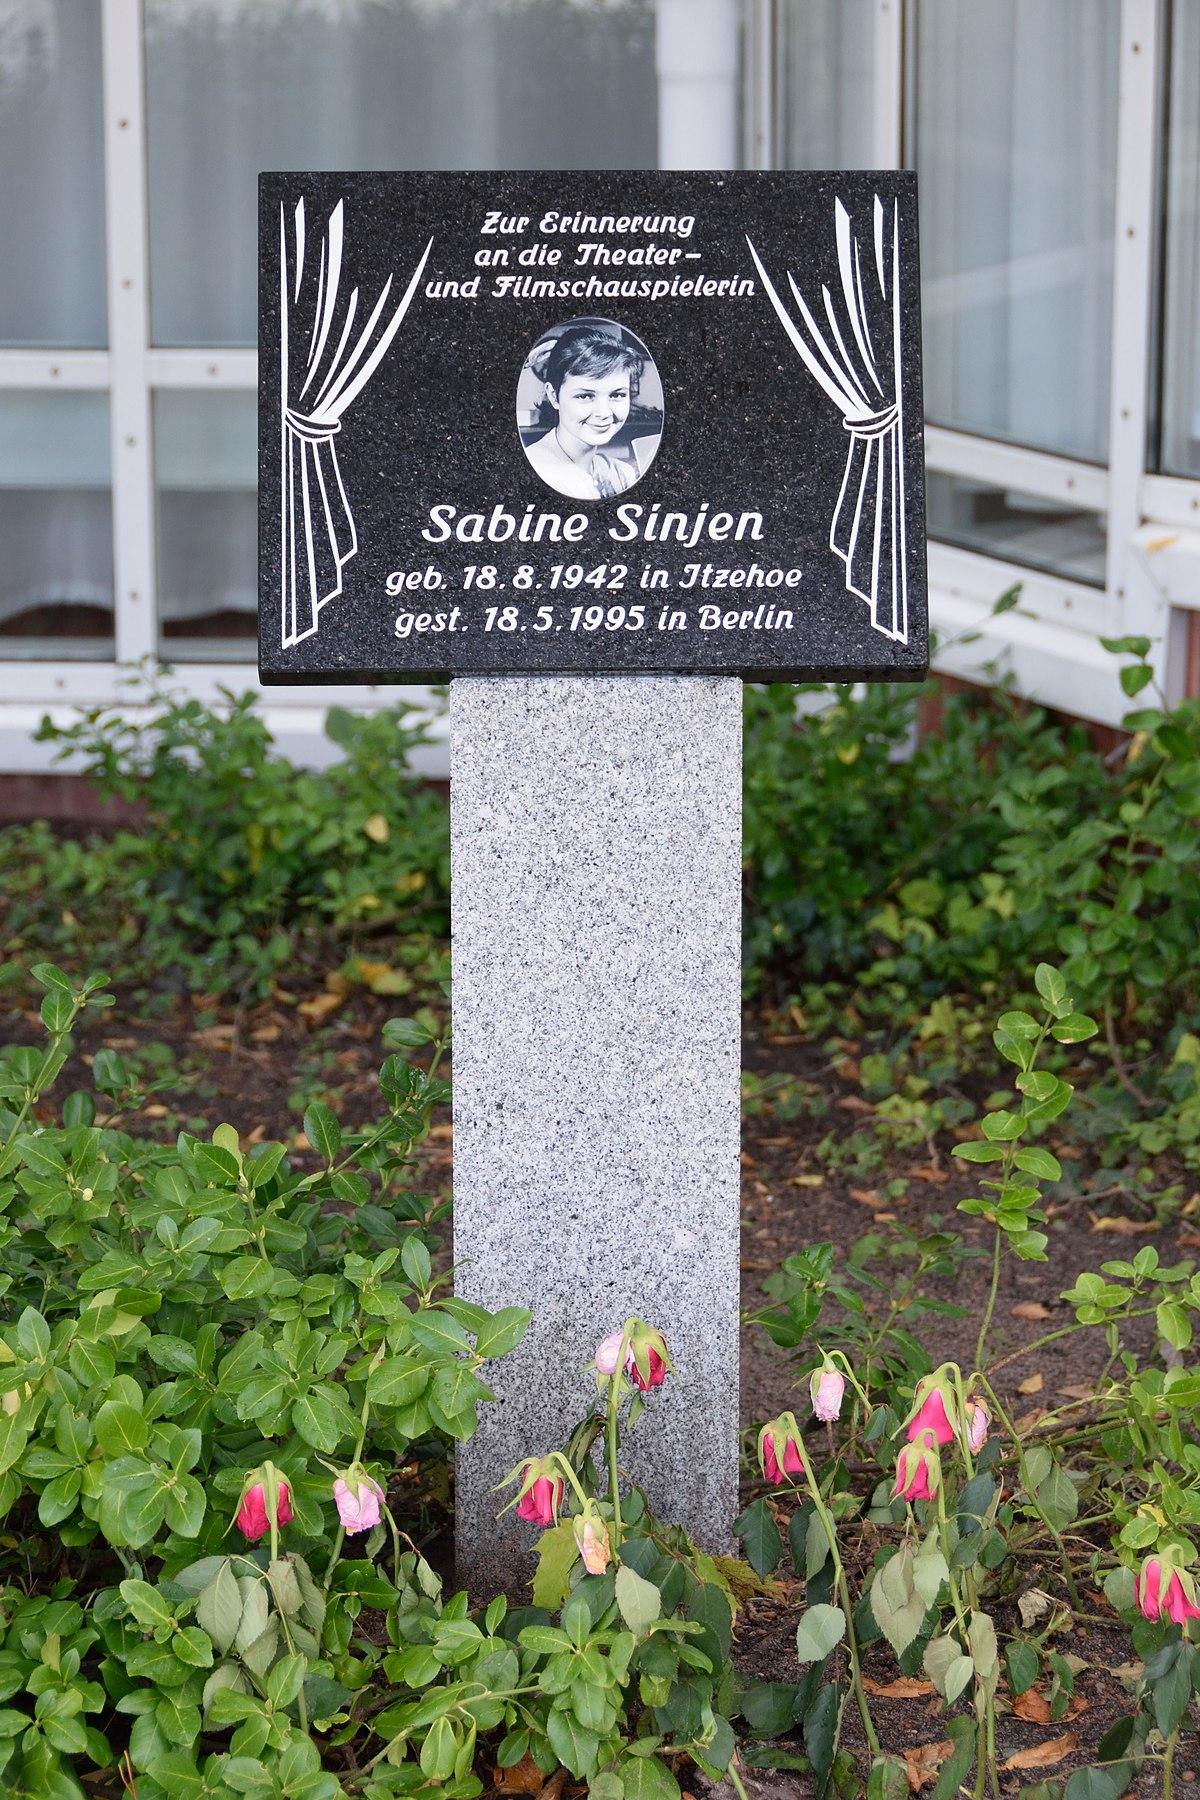 Sabine nackt Sinjen Sabine Sinjen